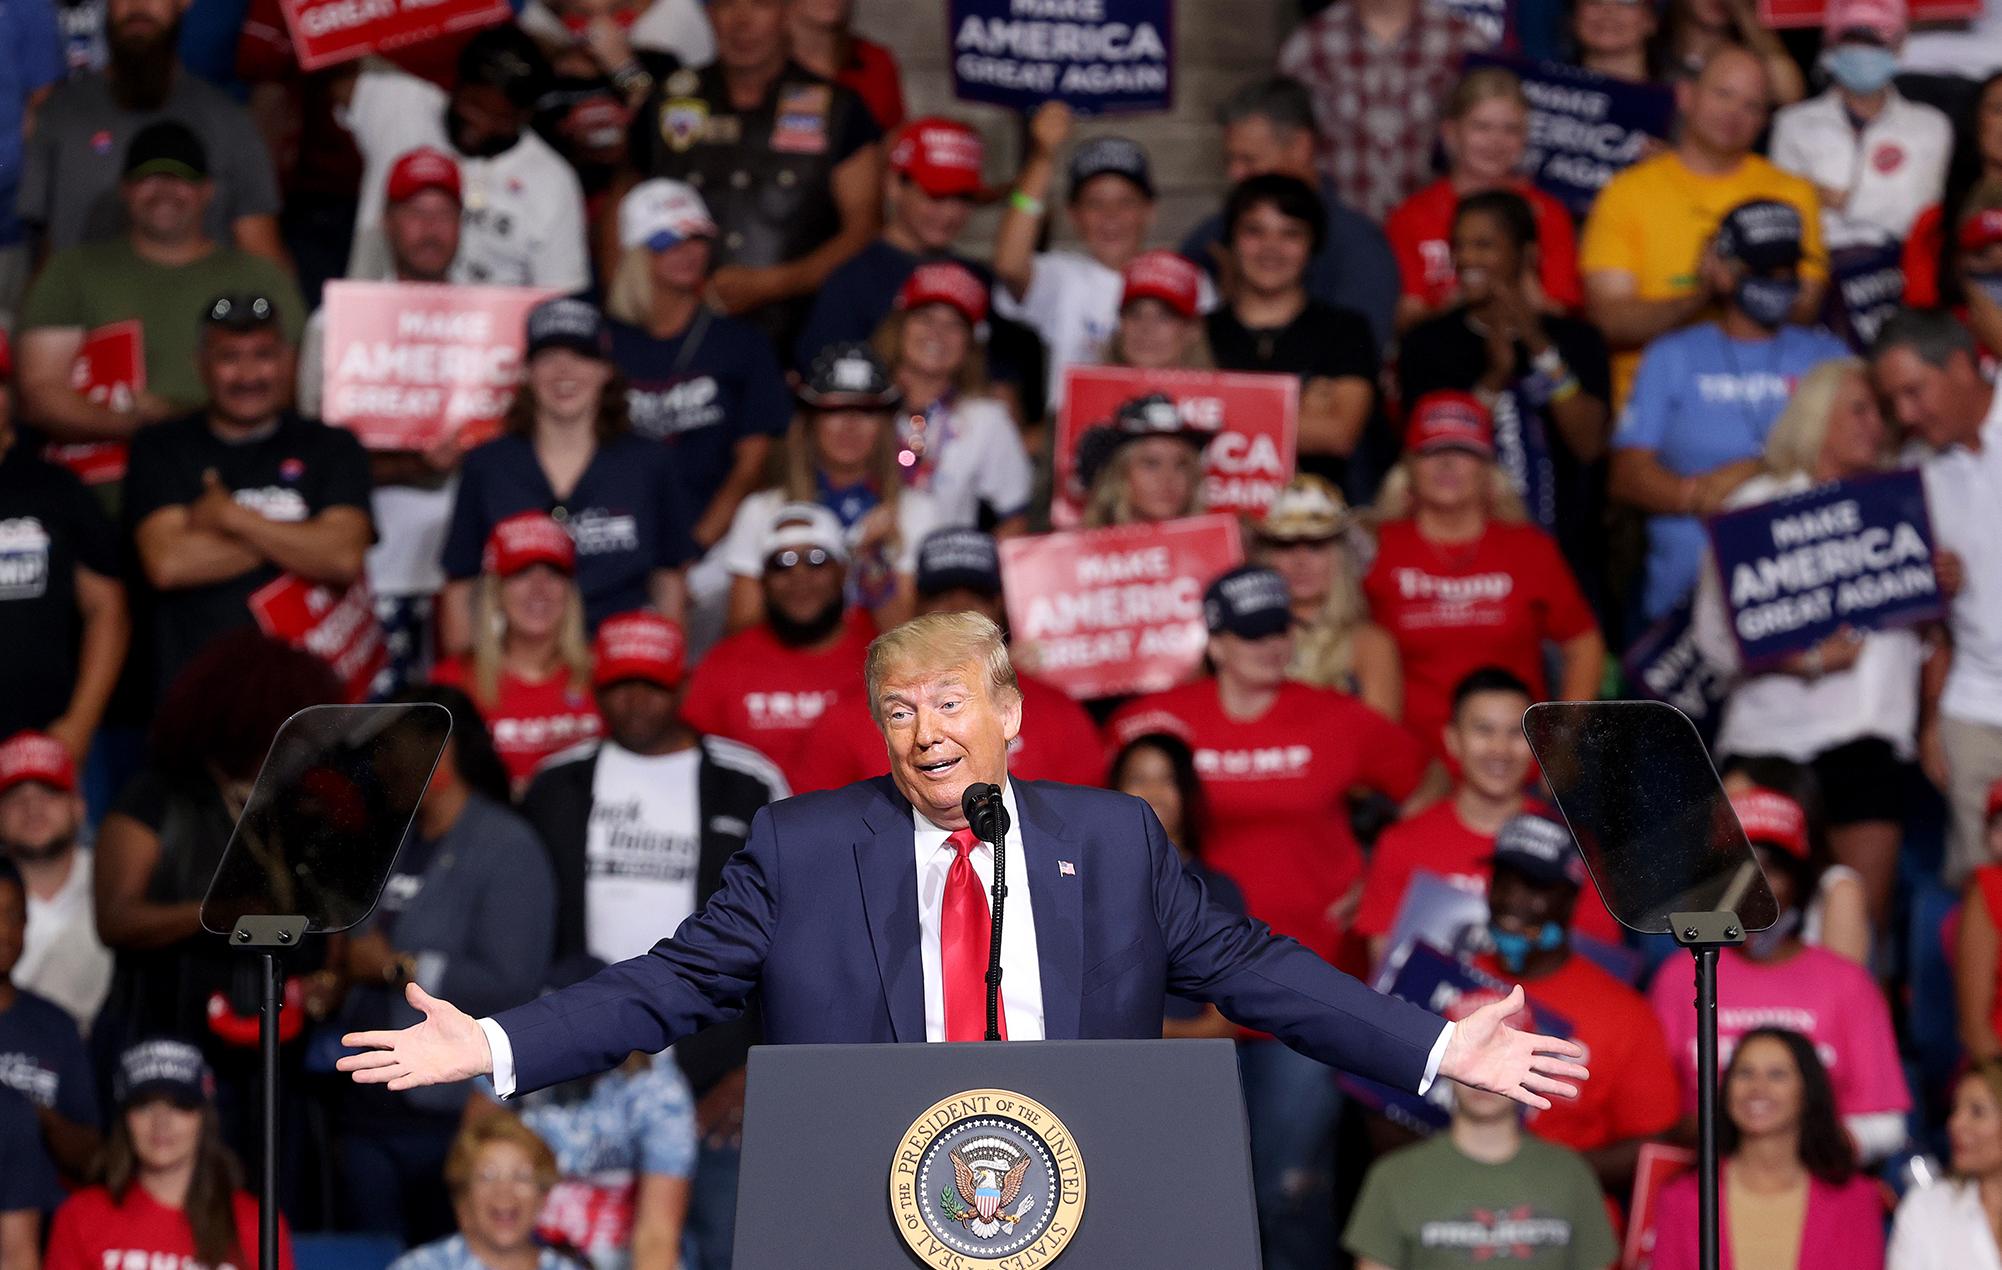 donald trump president rally tulsa rolling stones